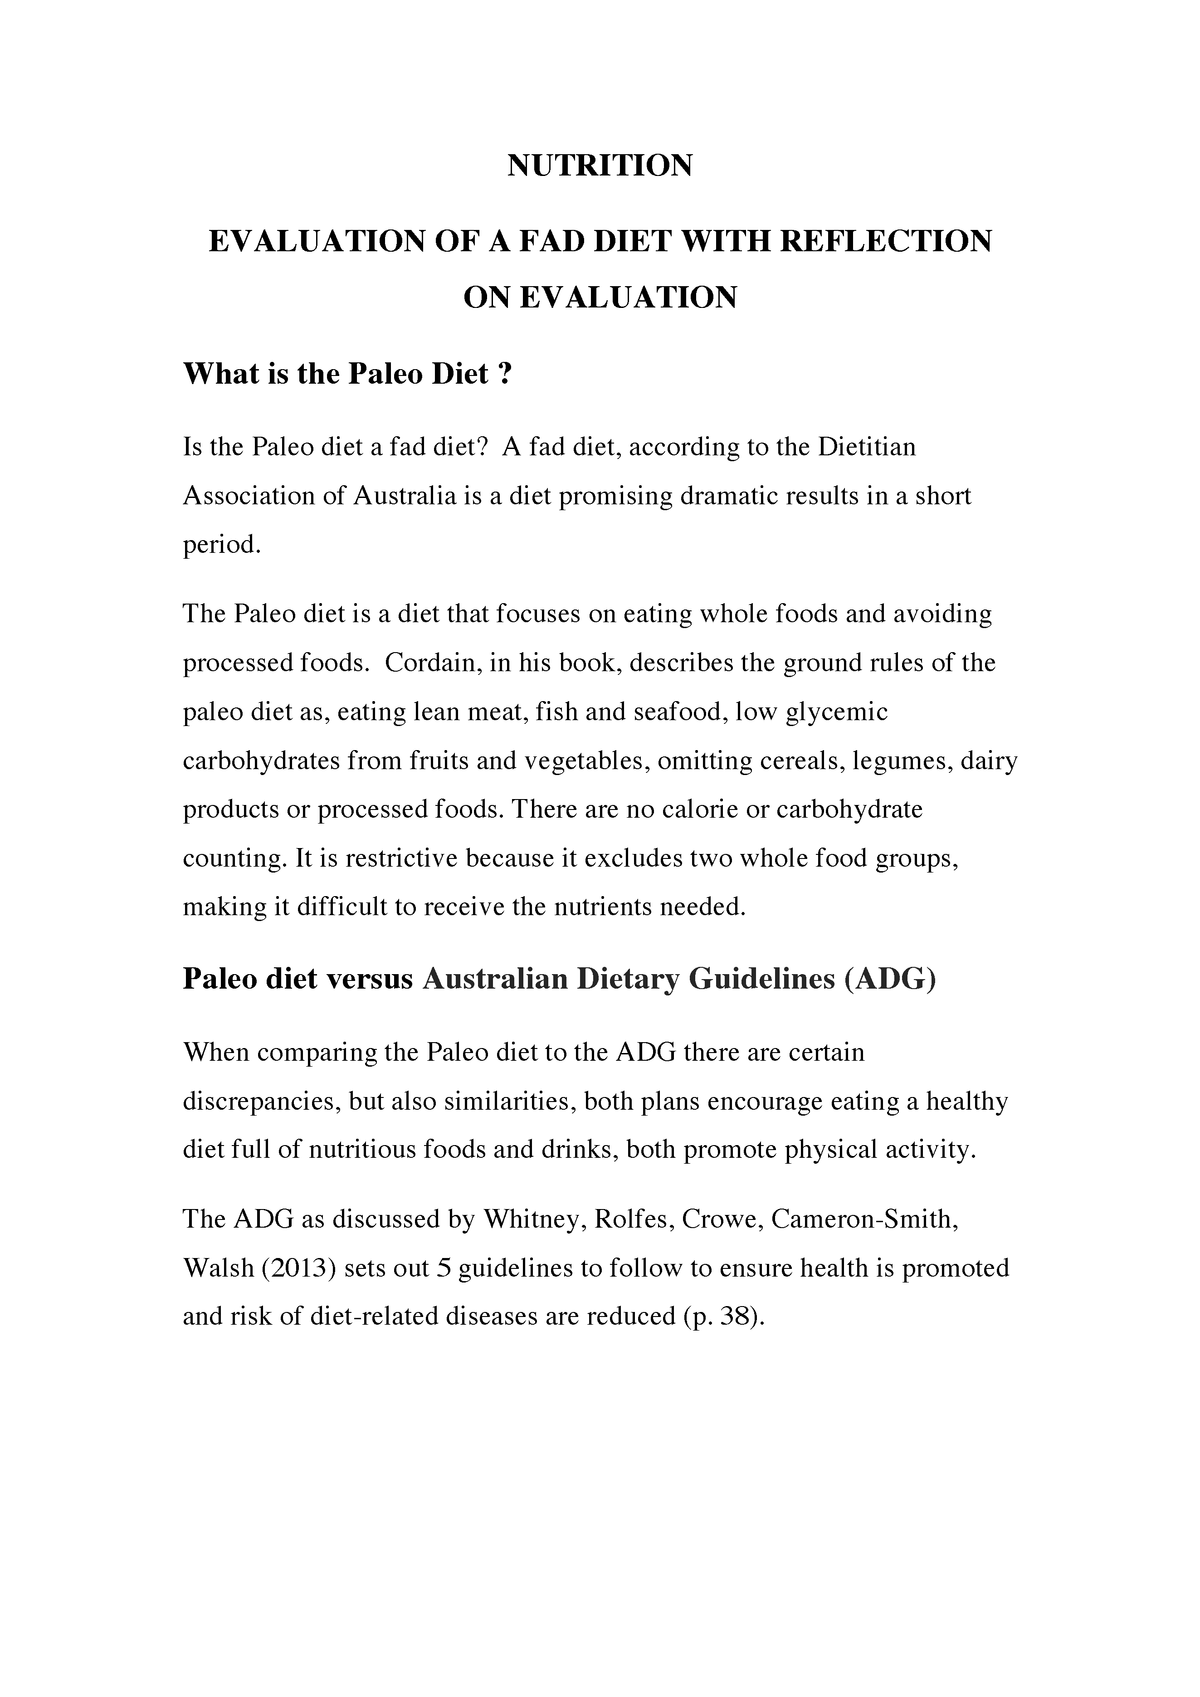 Nutritiou Diet Essay Healthy Lifestyle On Nutrition